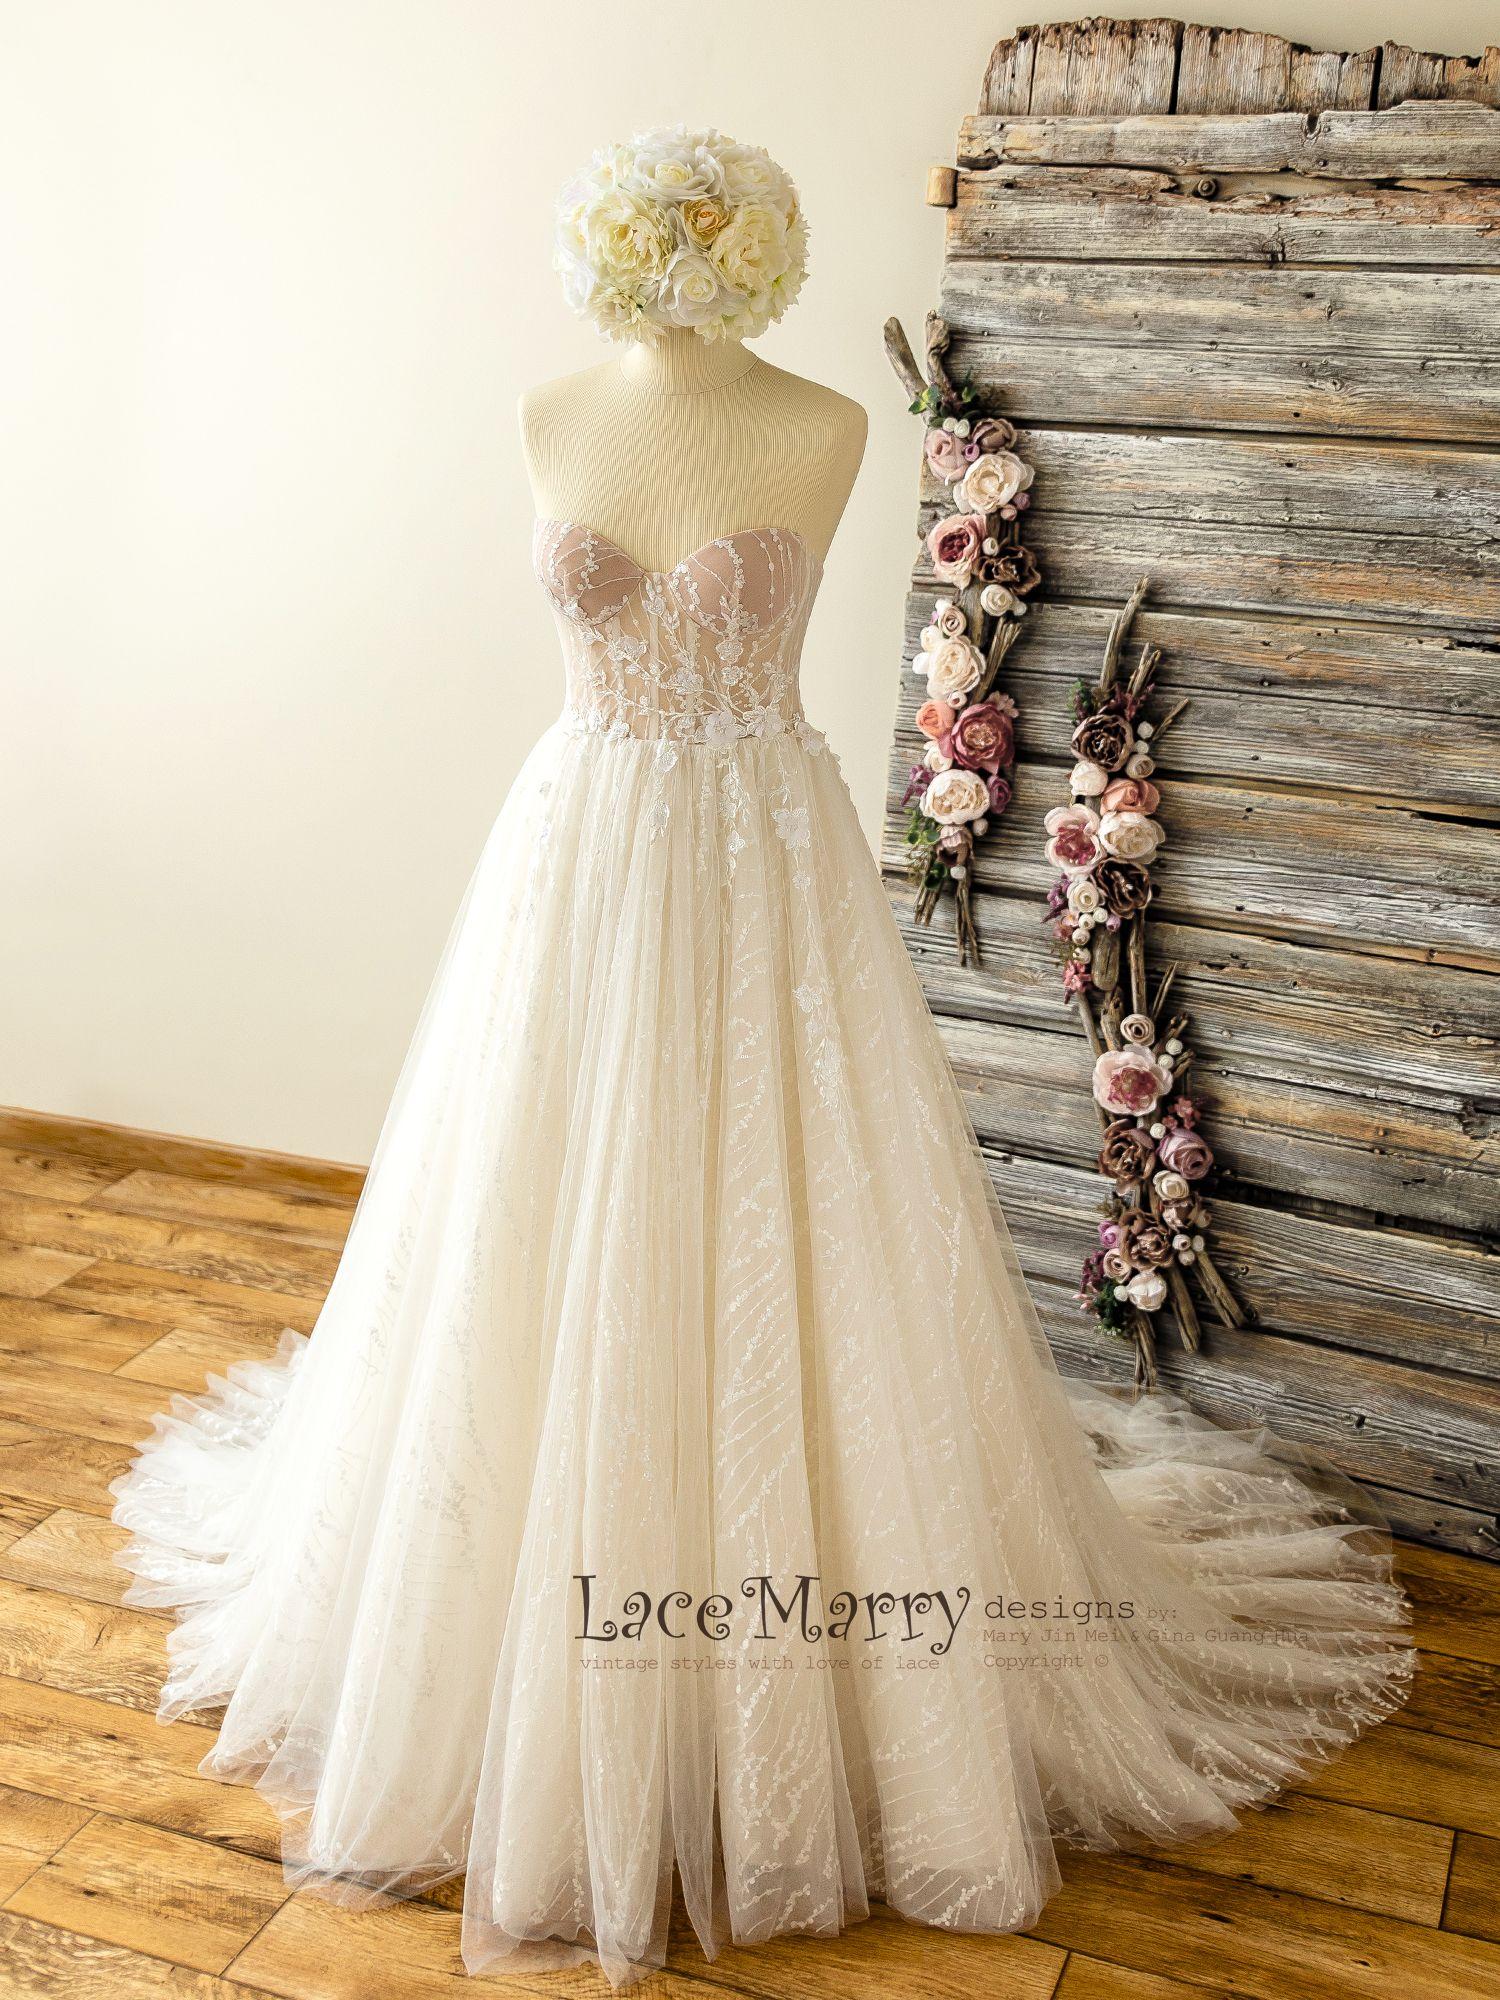 Sparkly Lace Wedding Dress with Strapless Bustier Neckline